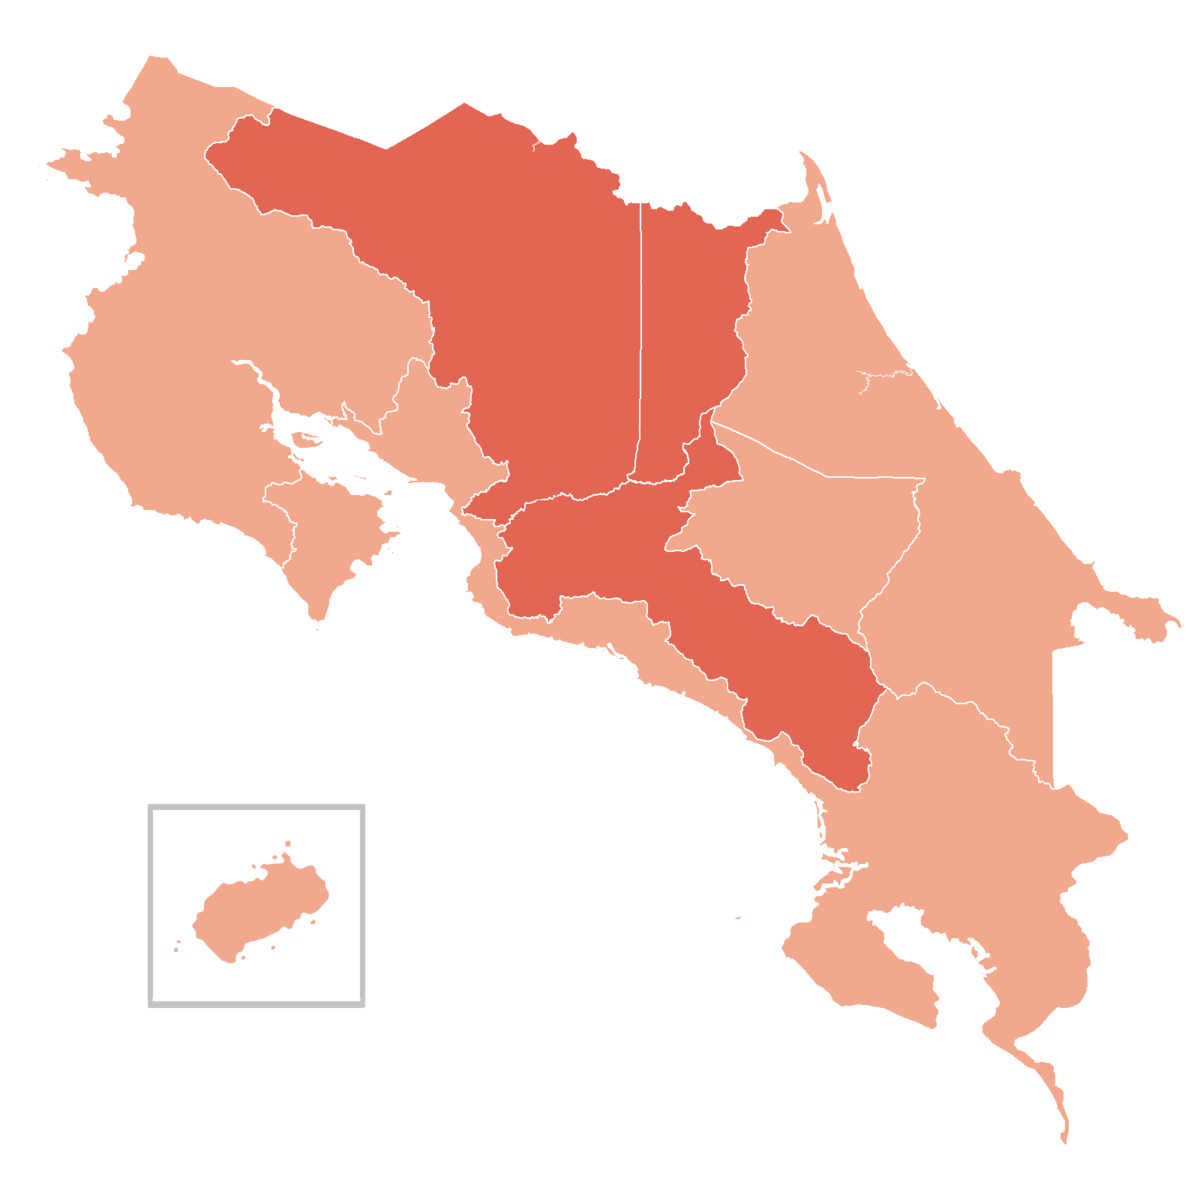 san antonio de belen costa rica map Covid 19 Pandemic In Costa Rica Wikipedia san antonio de belen costa rica map